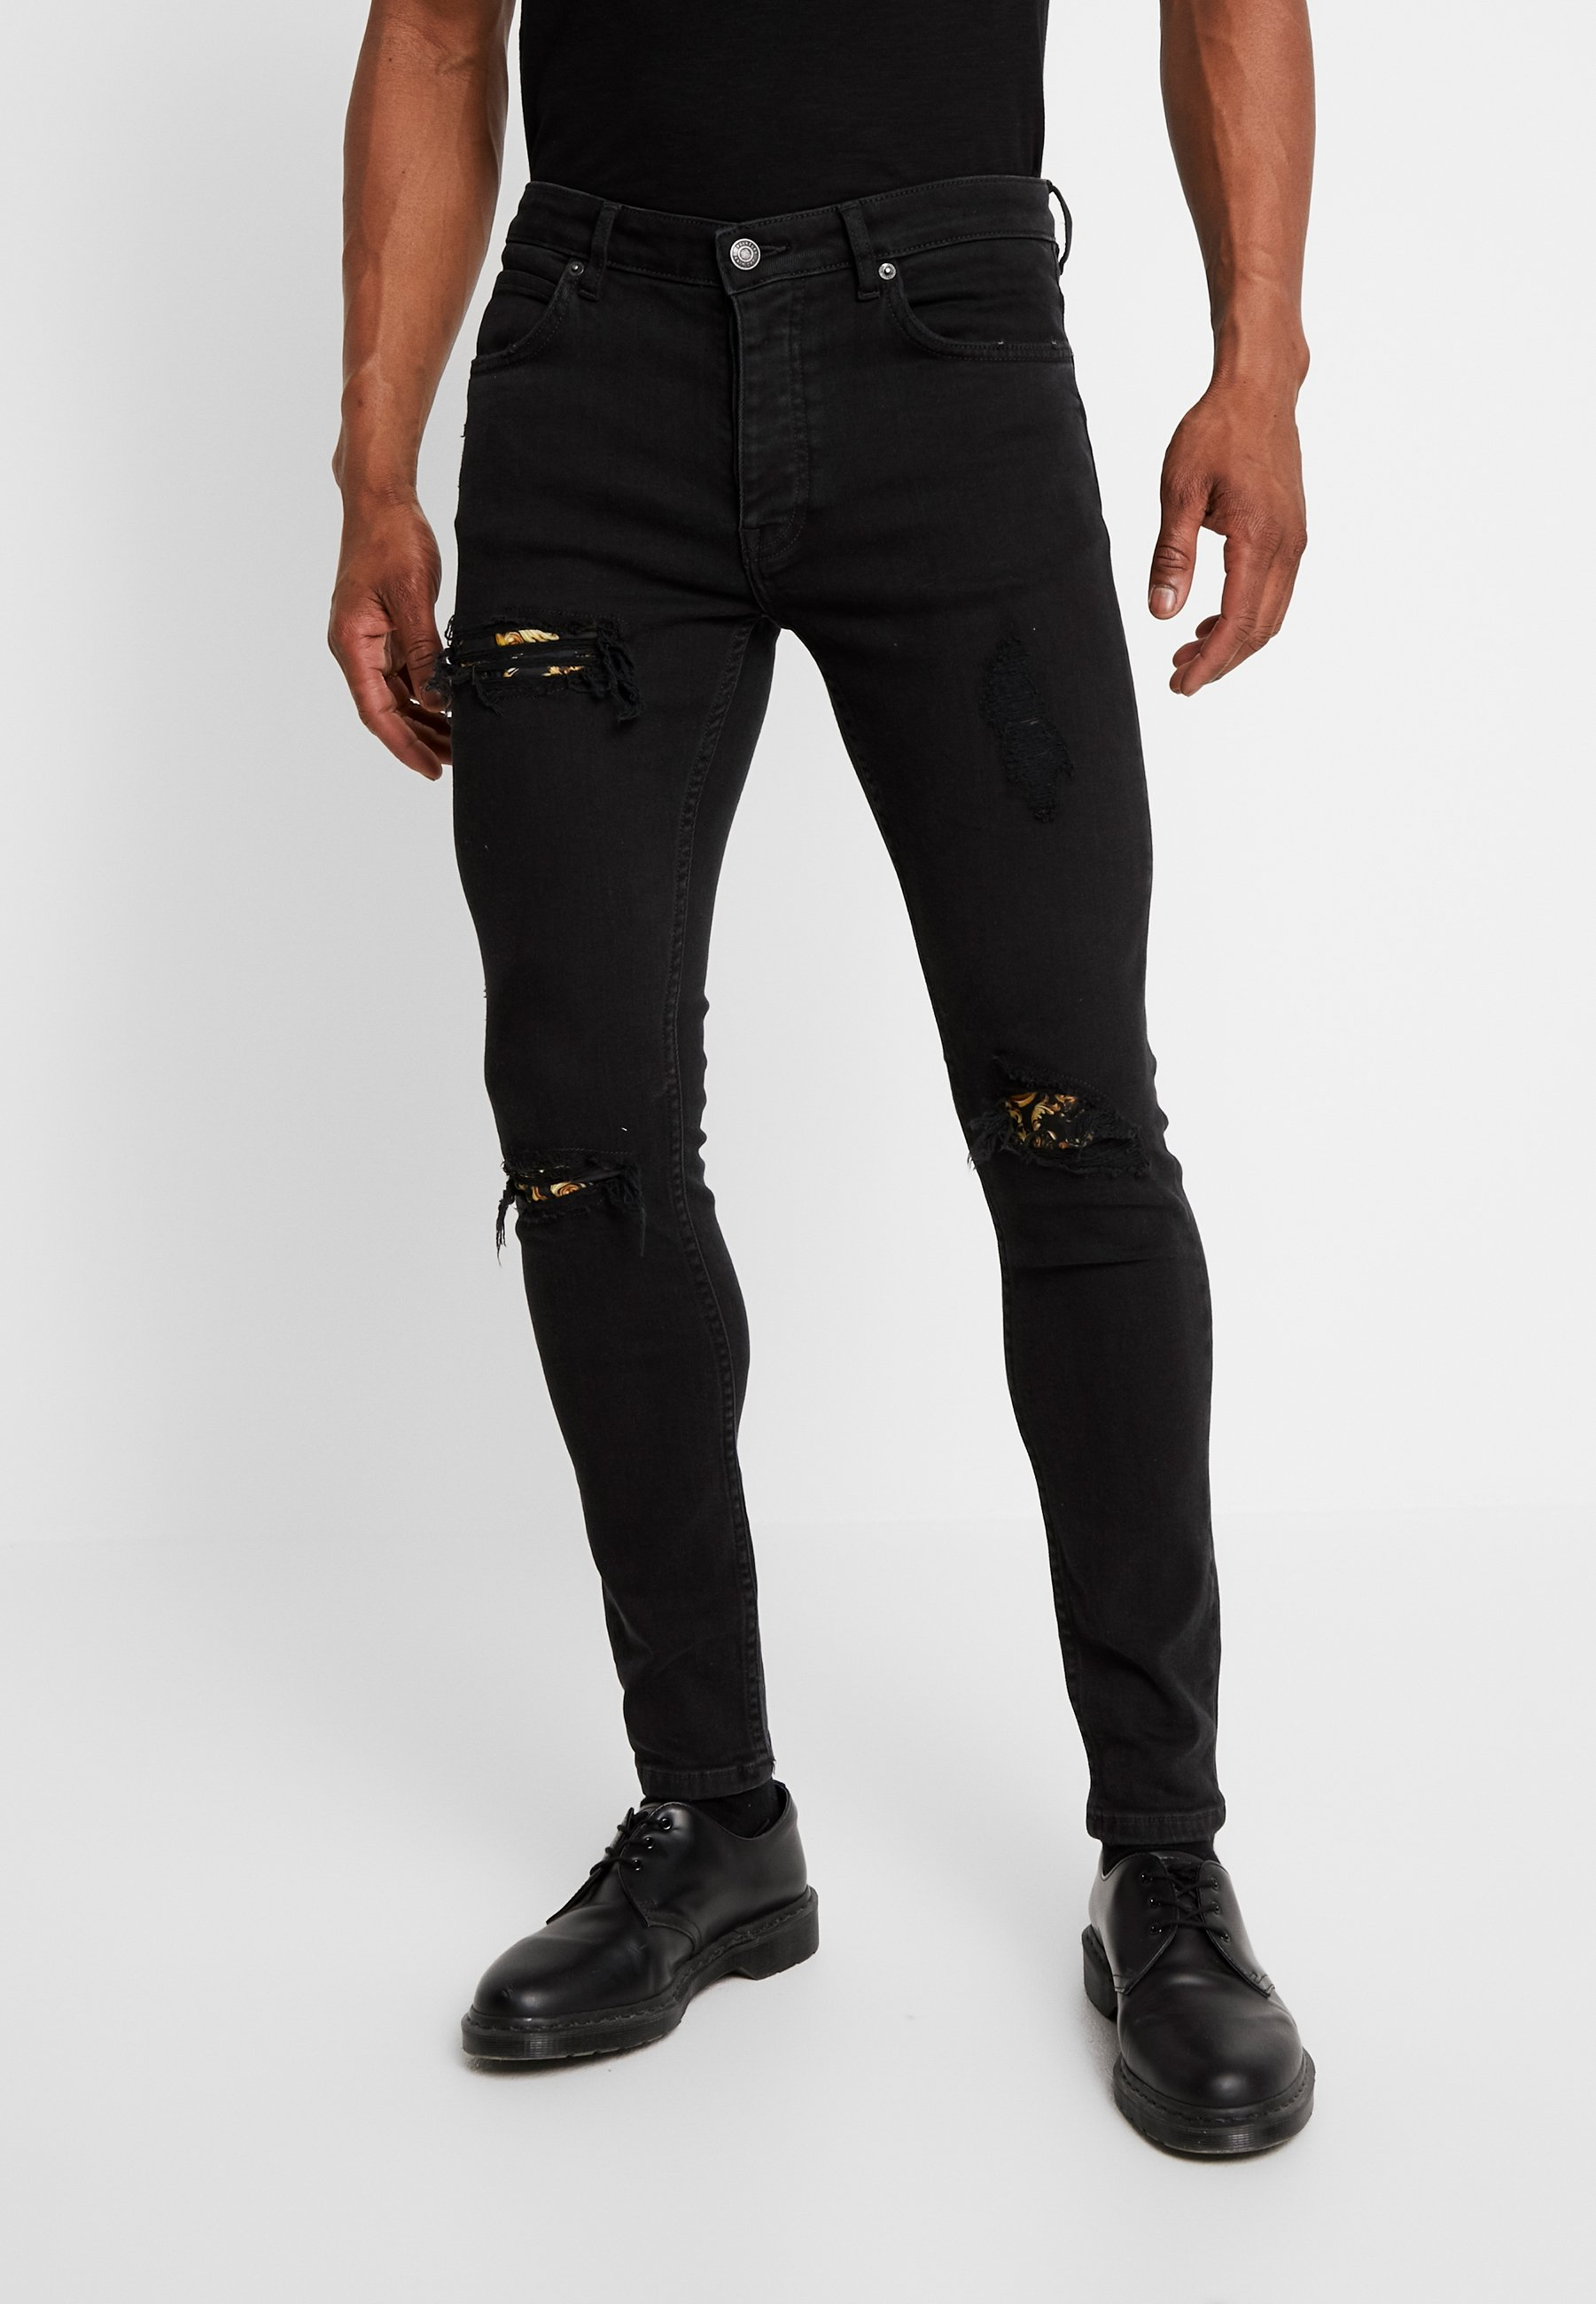 Black Denim Jeans Skinny Fit Yourturn wlZiOPXkuT